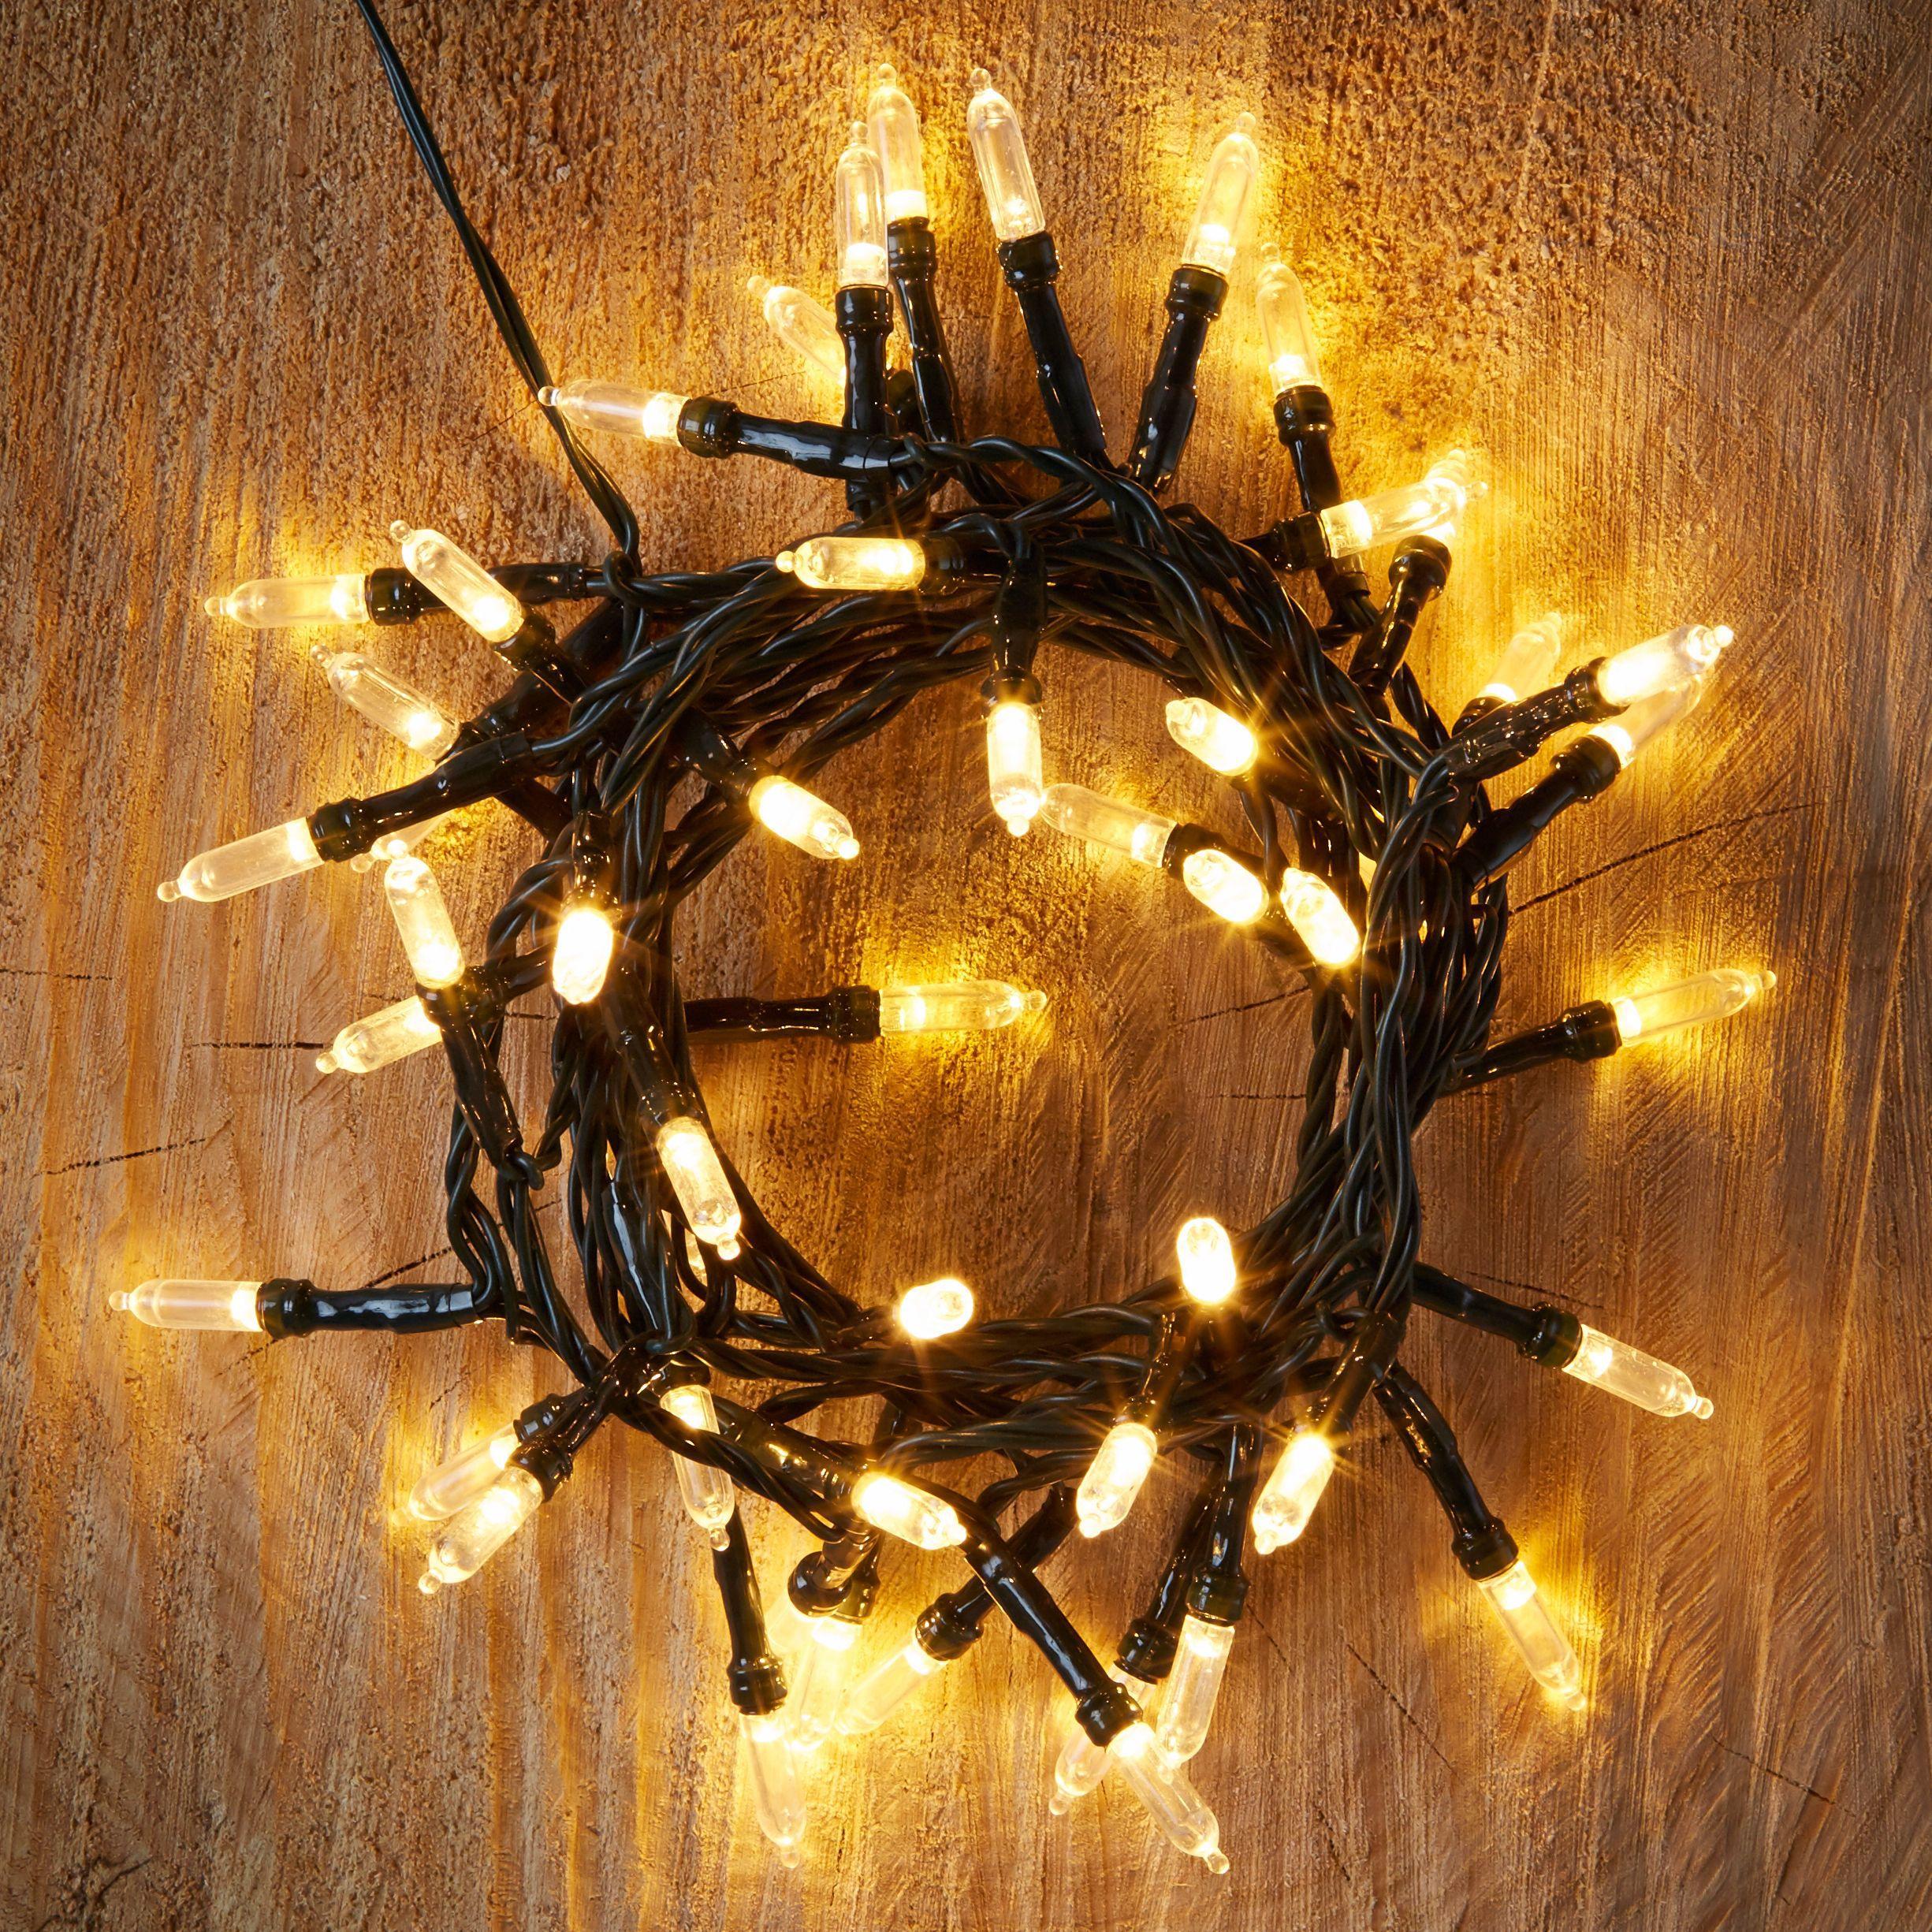 50 Warm White Led String Lights Departments Diy At B Q